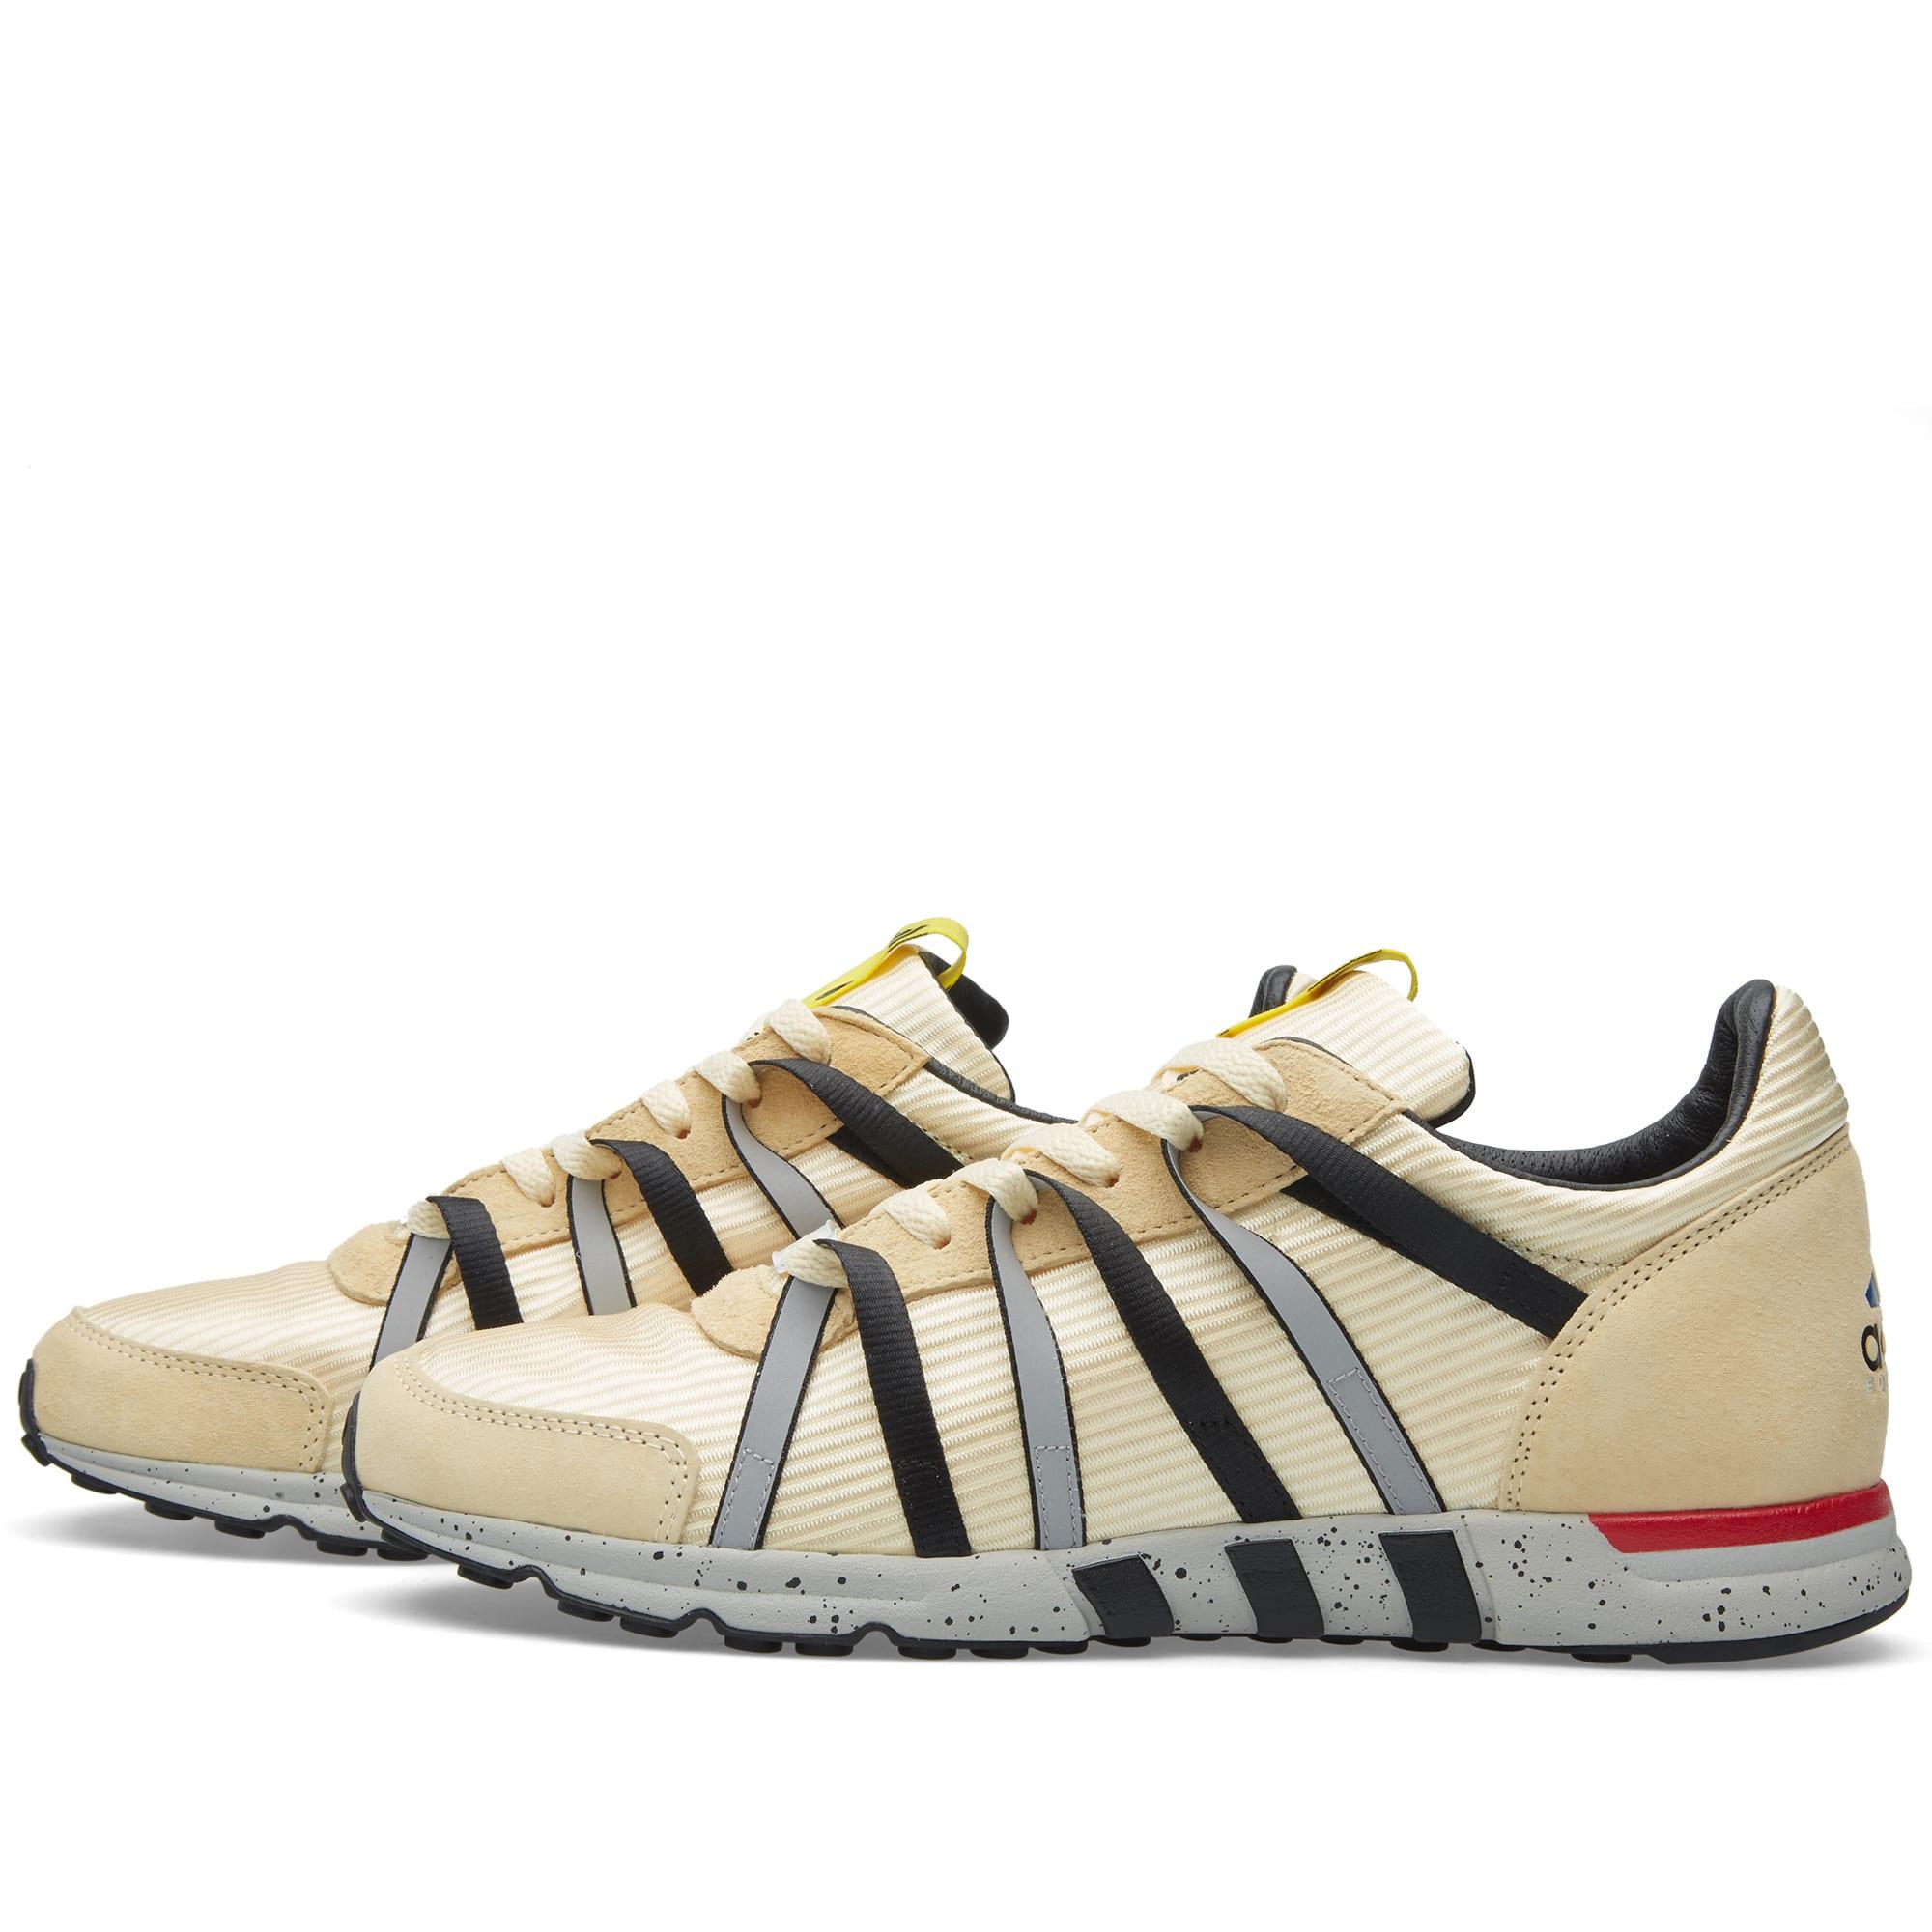 buy popular 73687 849c8 Adidas Consortium x Overkill EQT Racer '93 'Taxi'